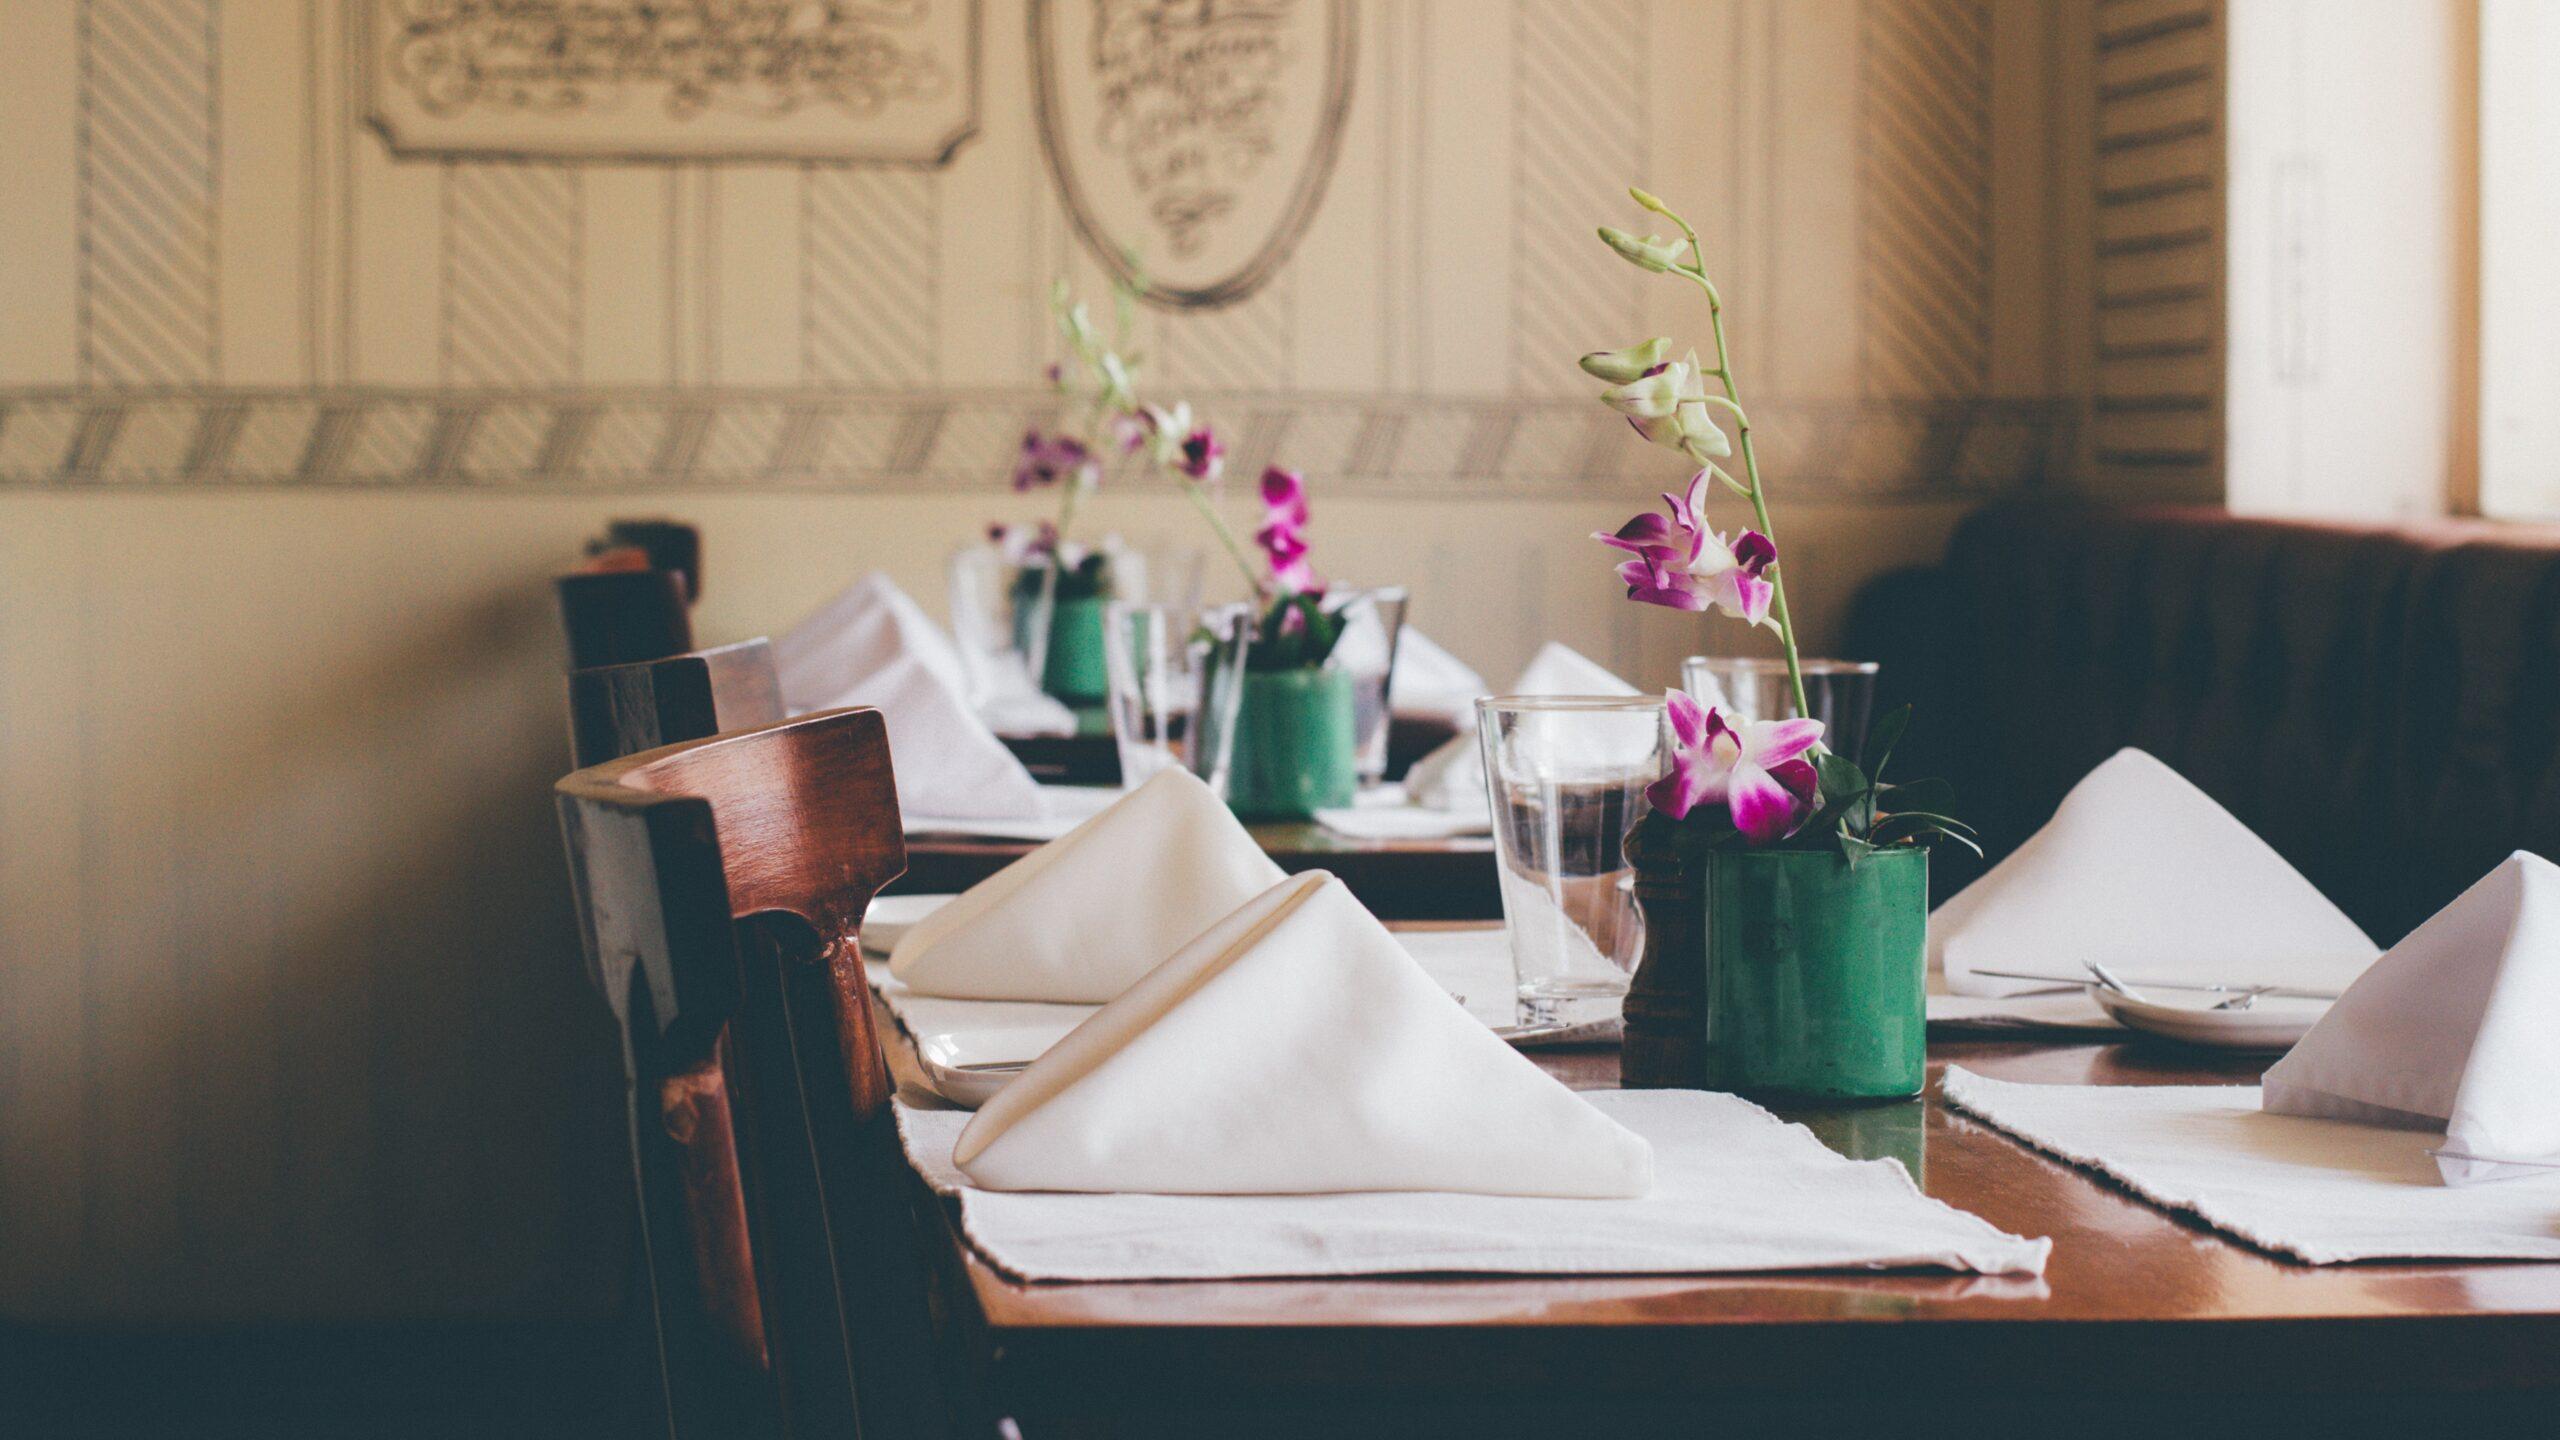 Dining Table Setup Inspiration